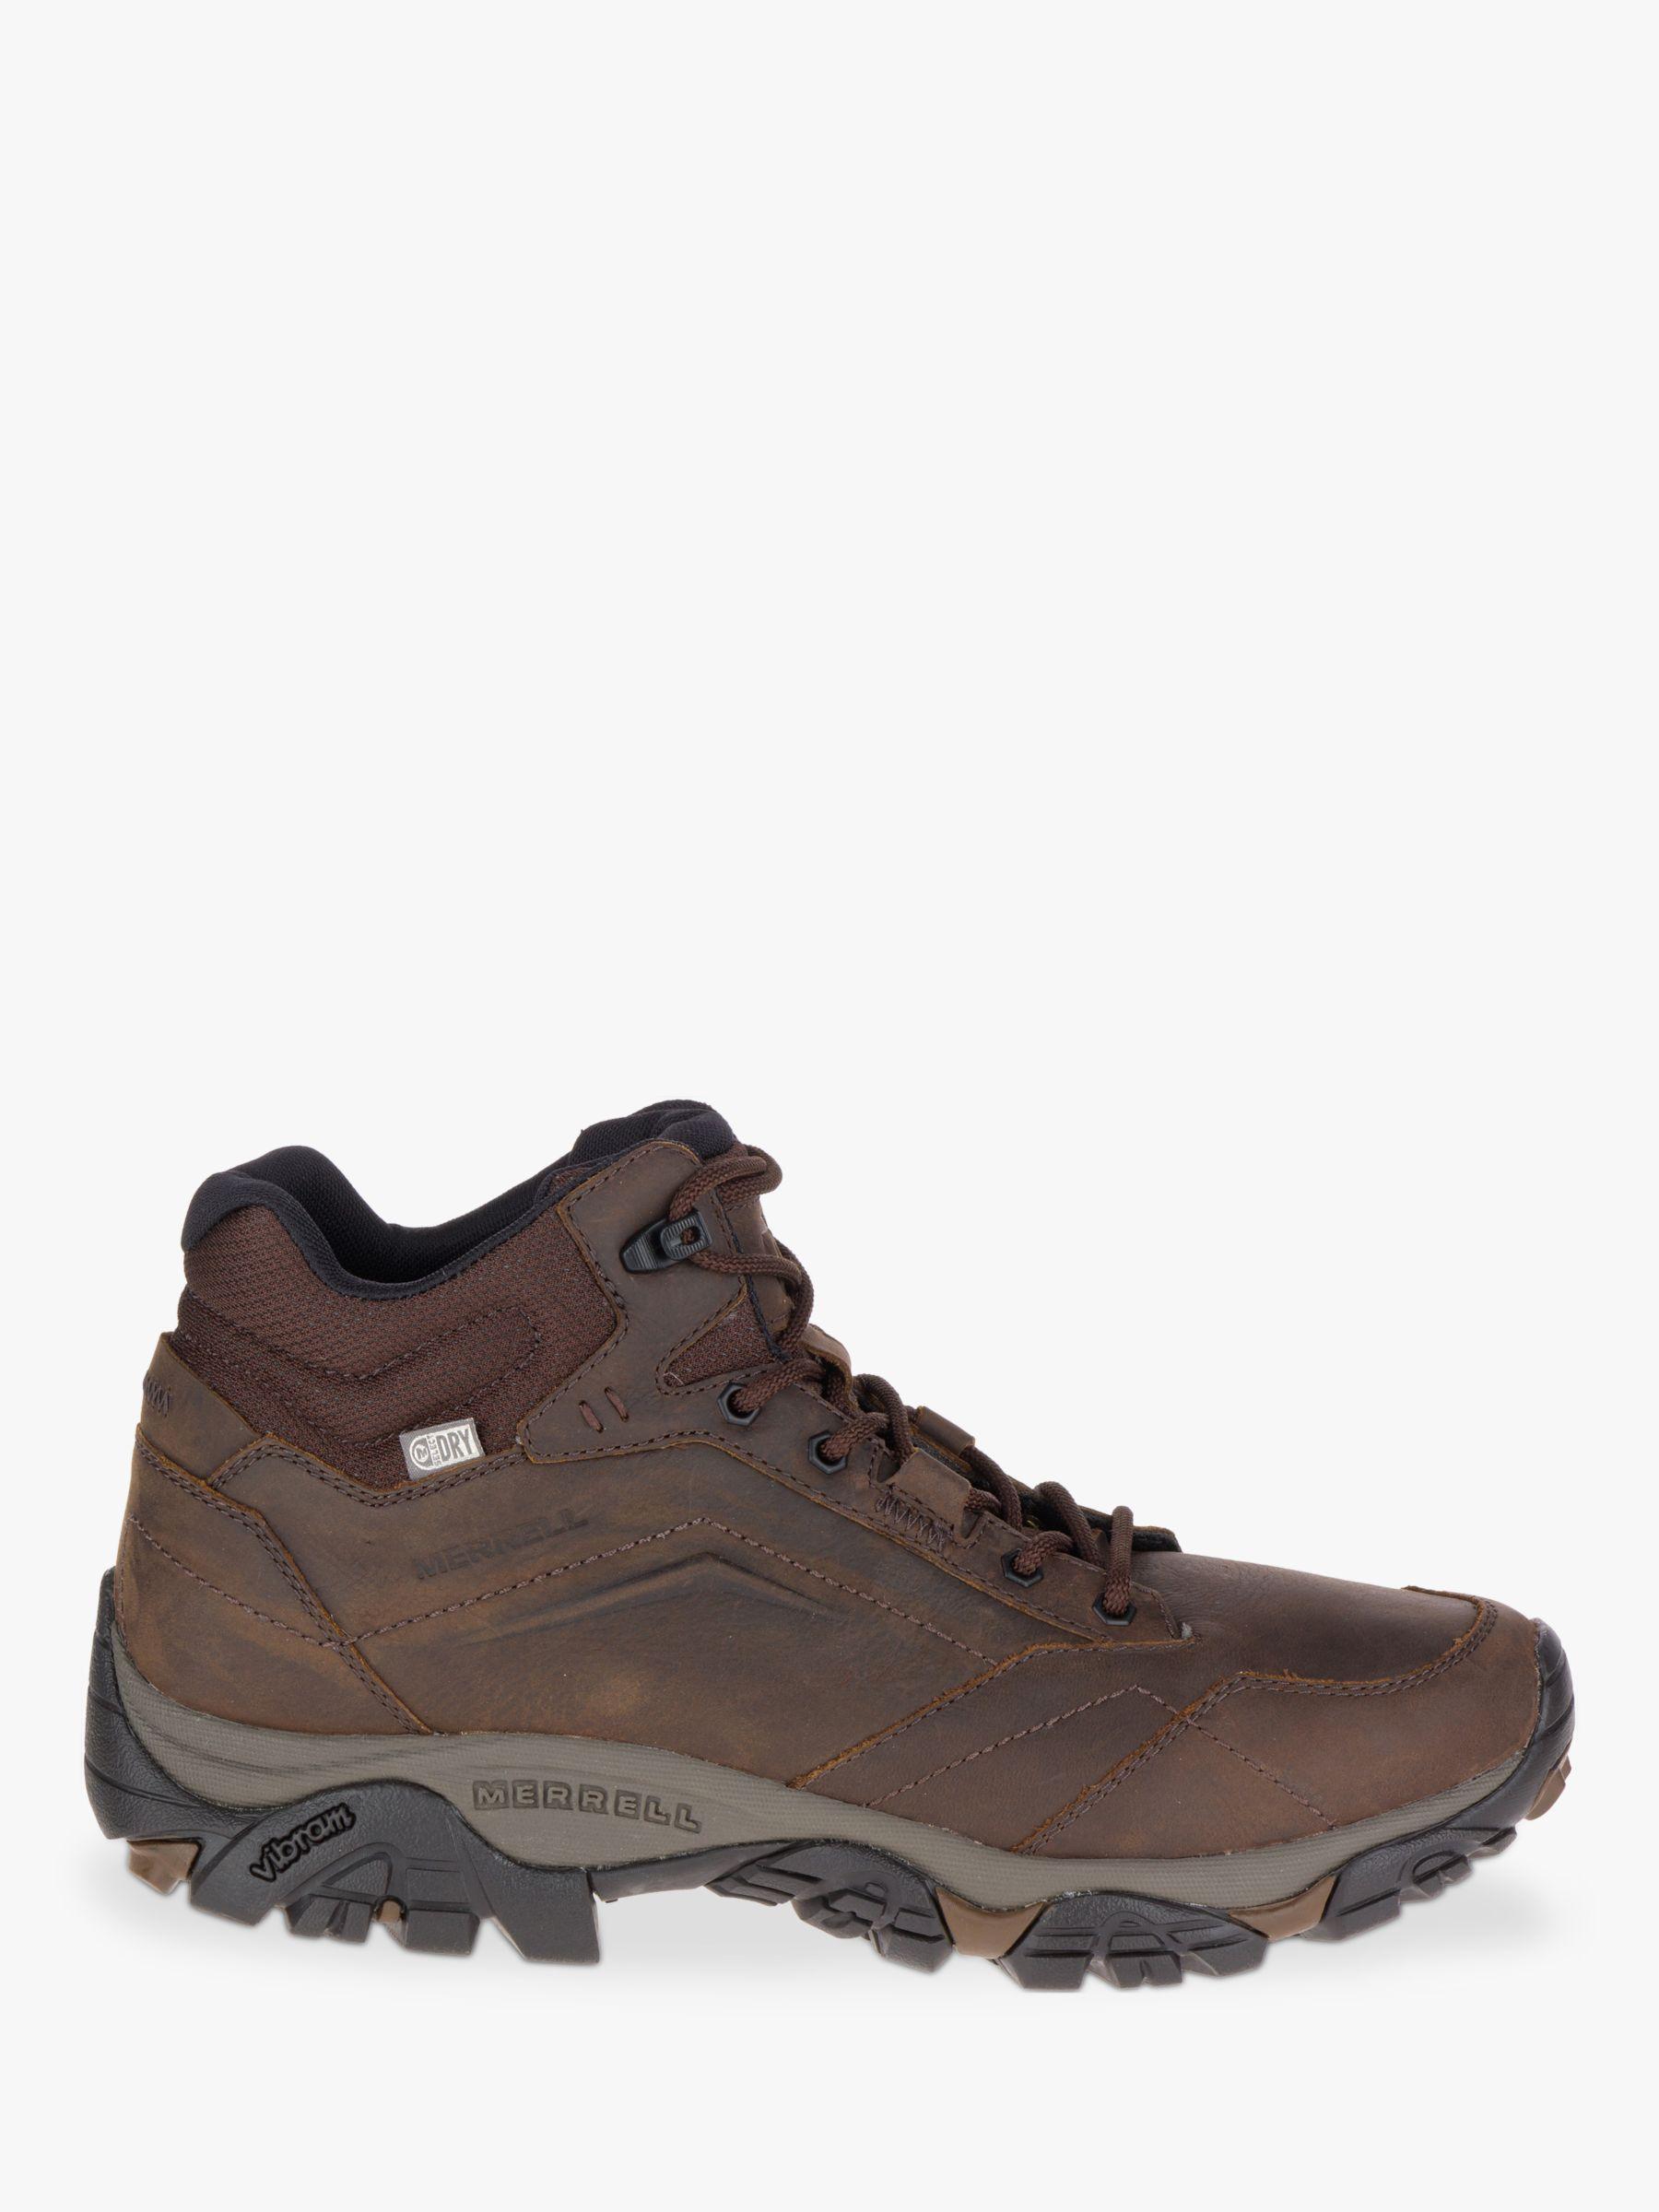 Merrell Merrell MOAB Adventure Mid Waterproof Men's Hiking Boots, Dark Earth